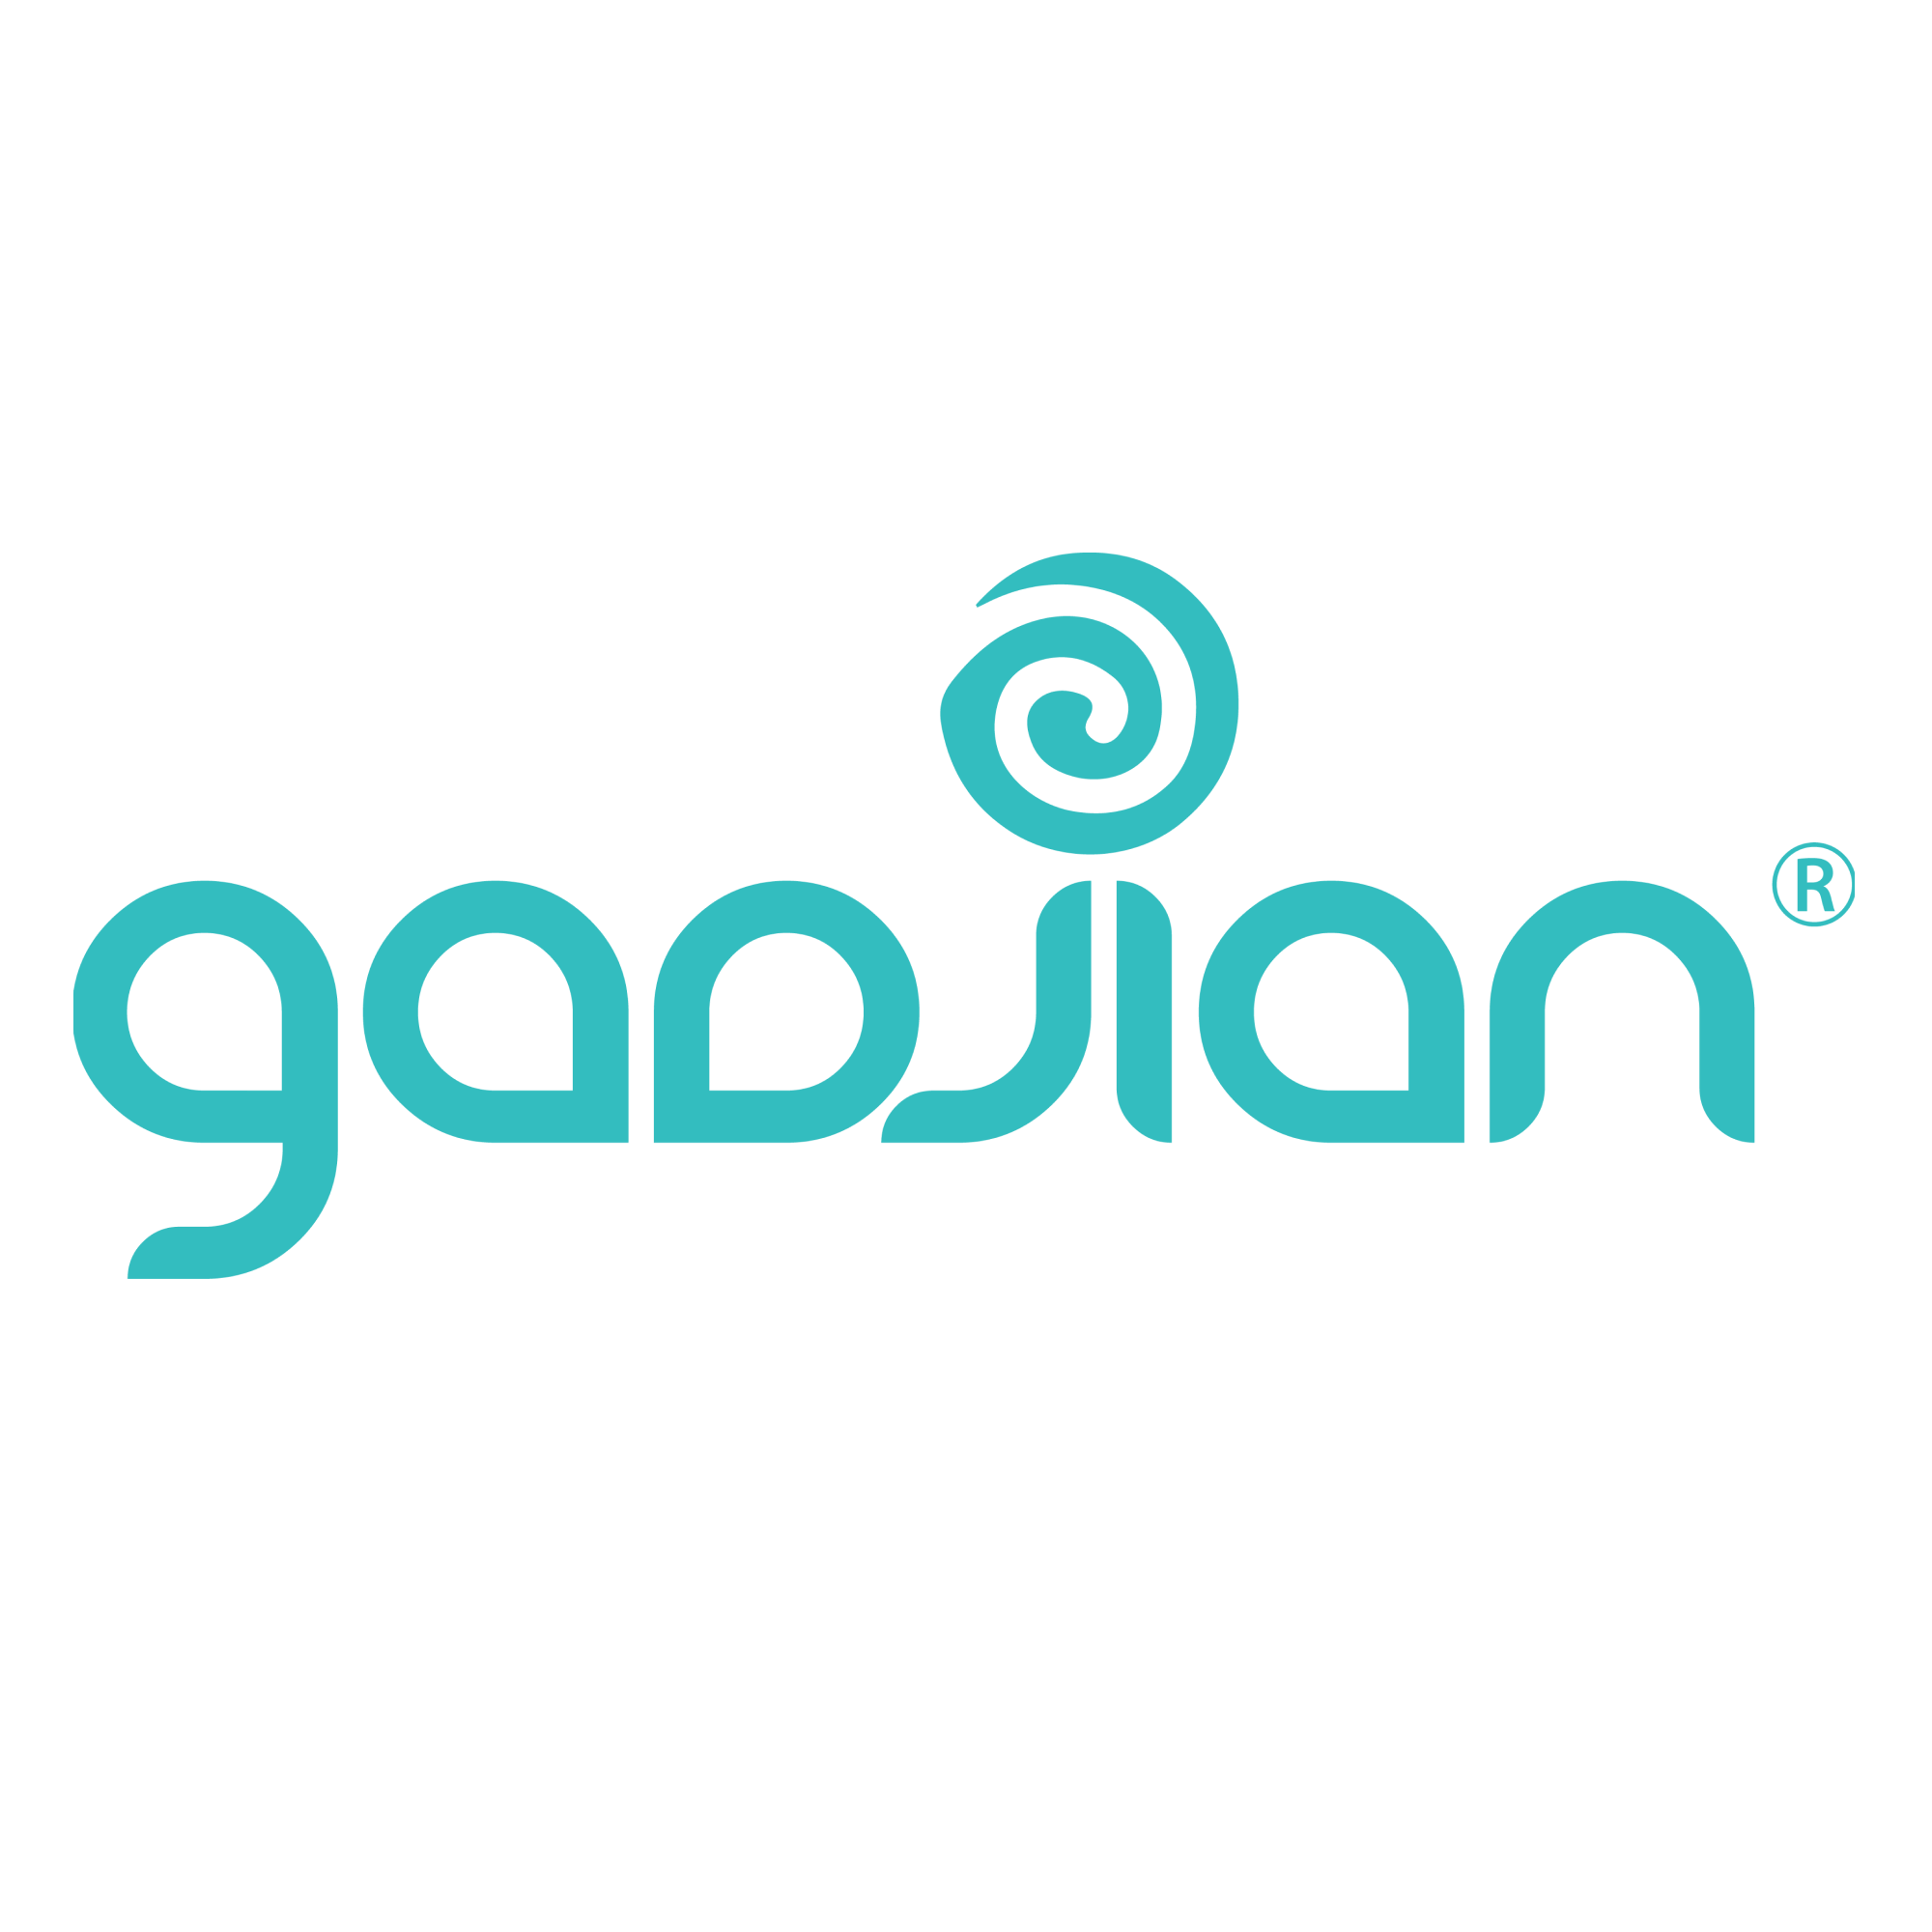 Gadjian